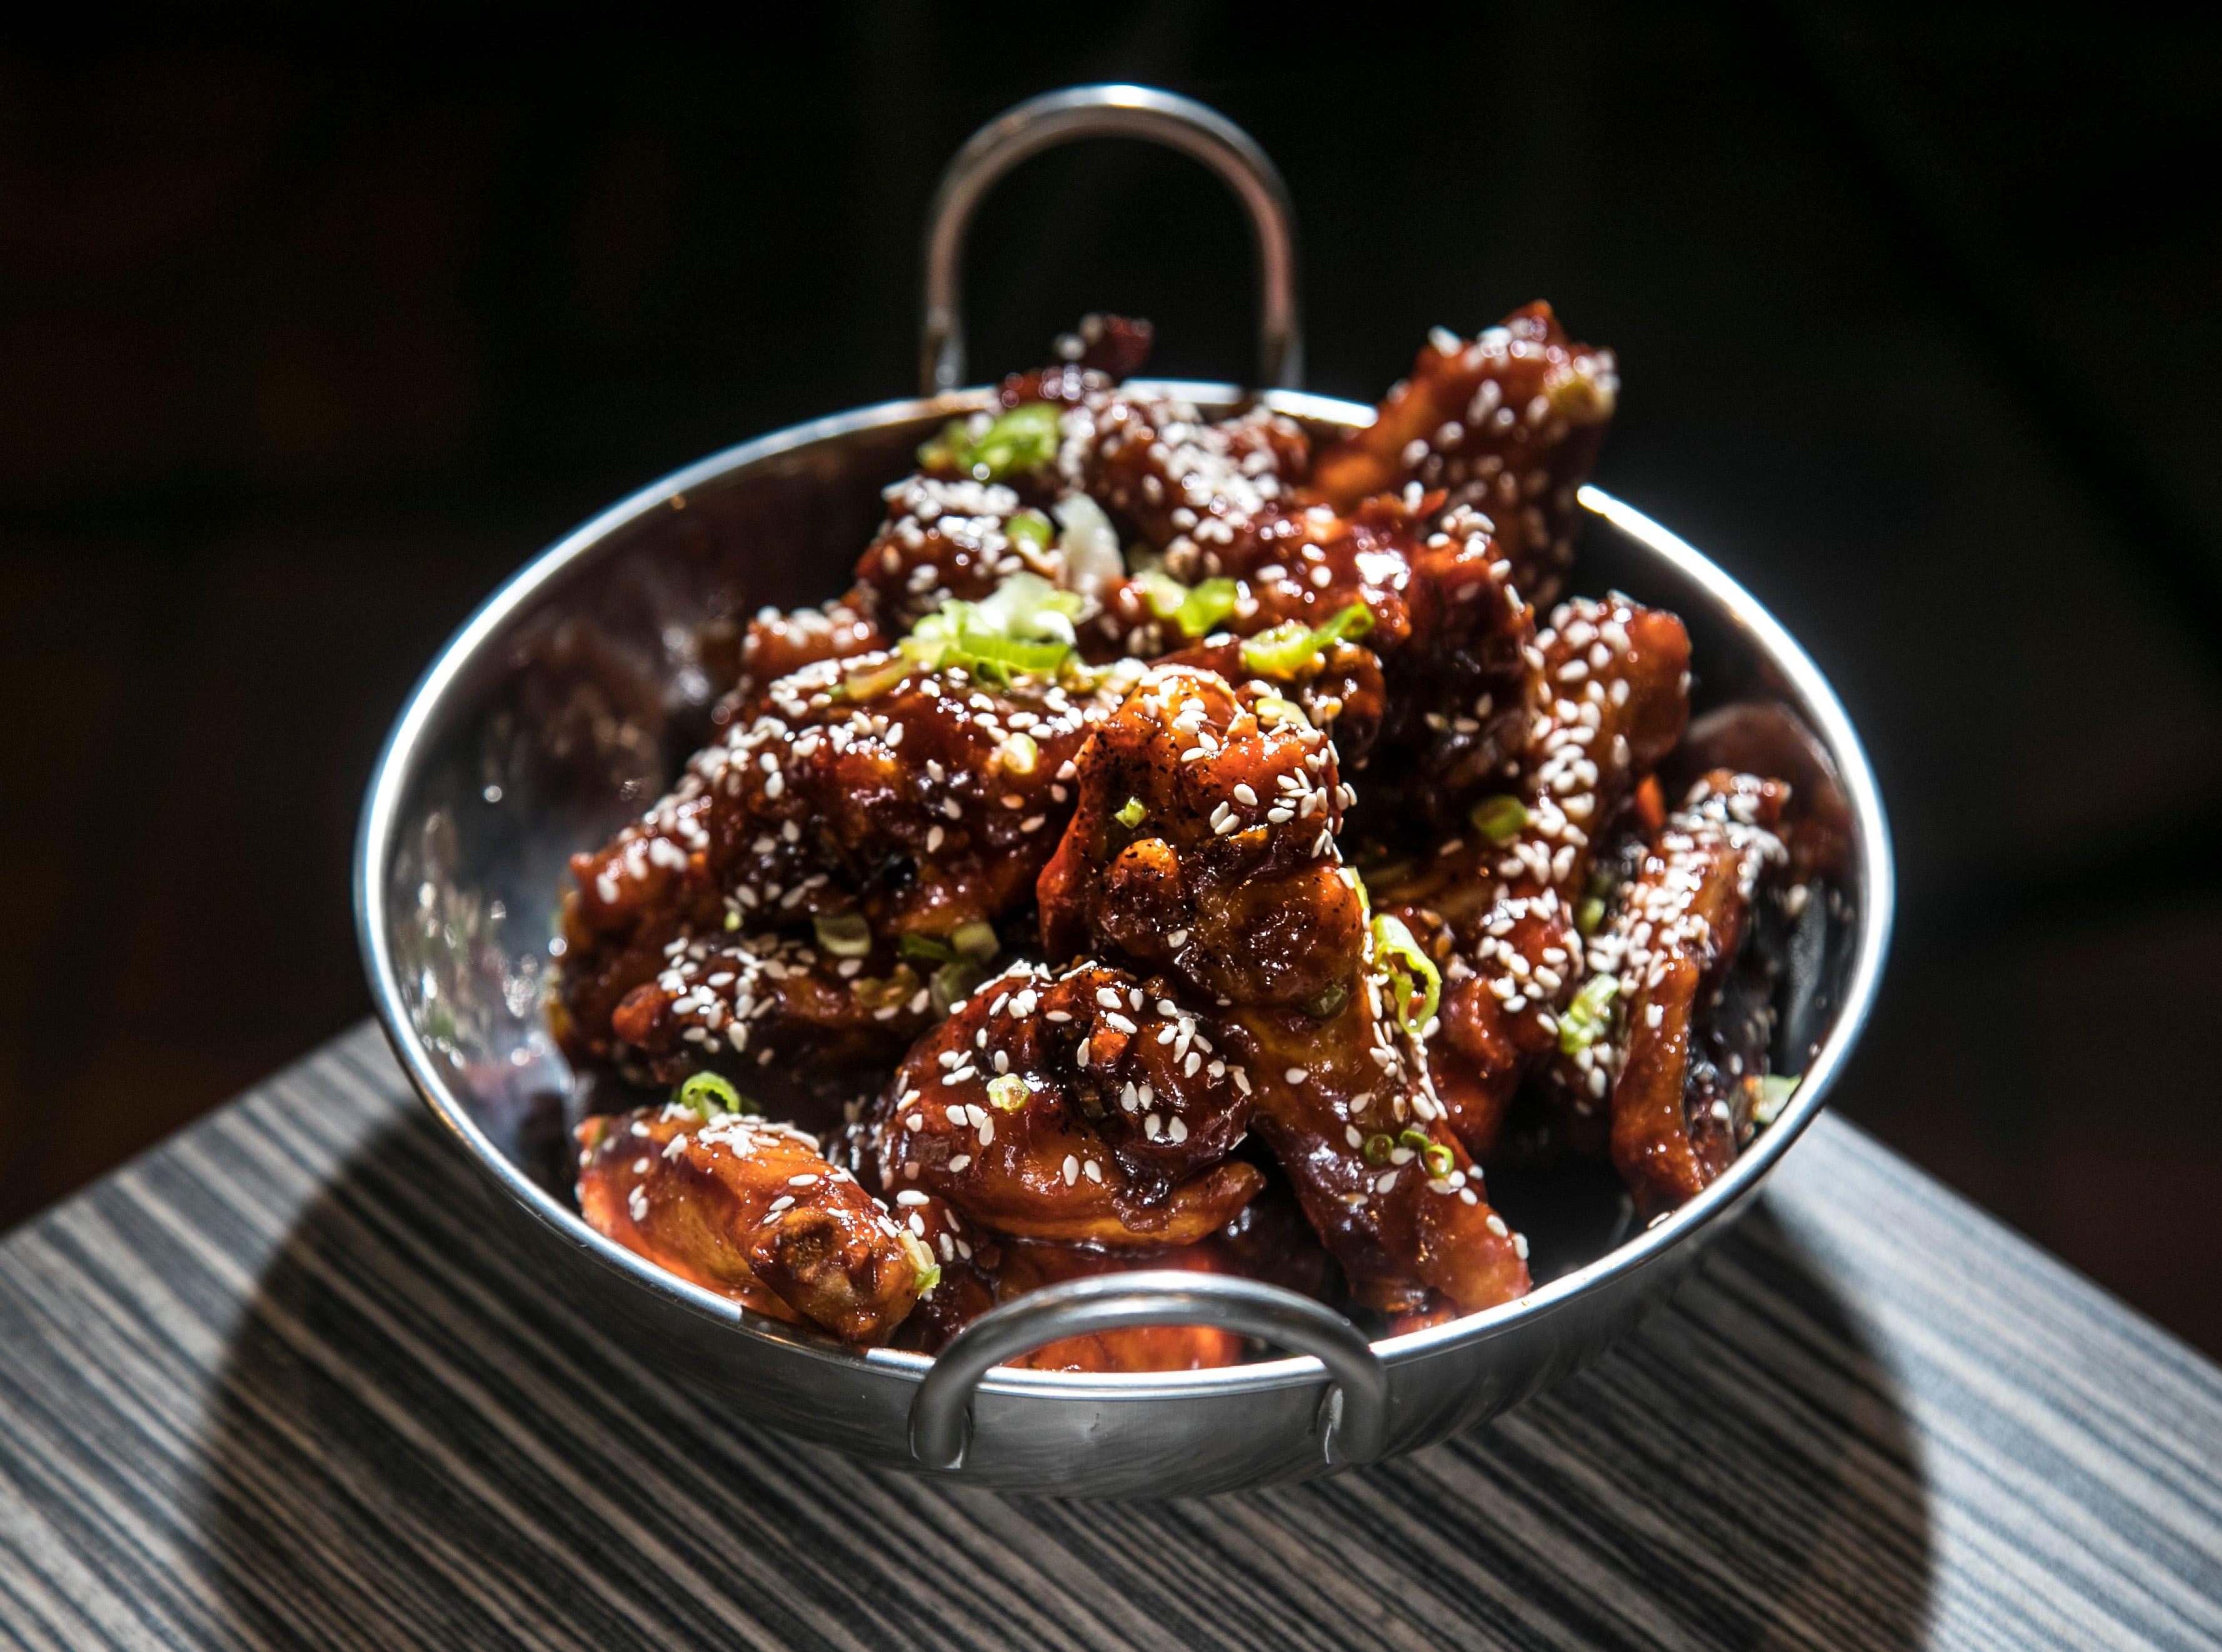 Butchertown Pizza Hall's Spicy Korean wings. Sept. 27, 2018